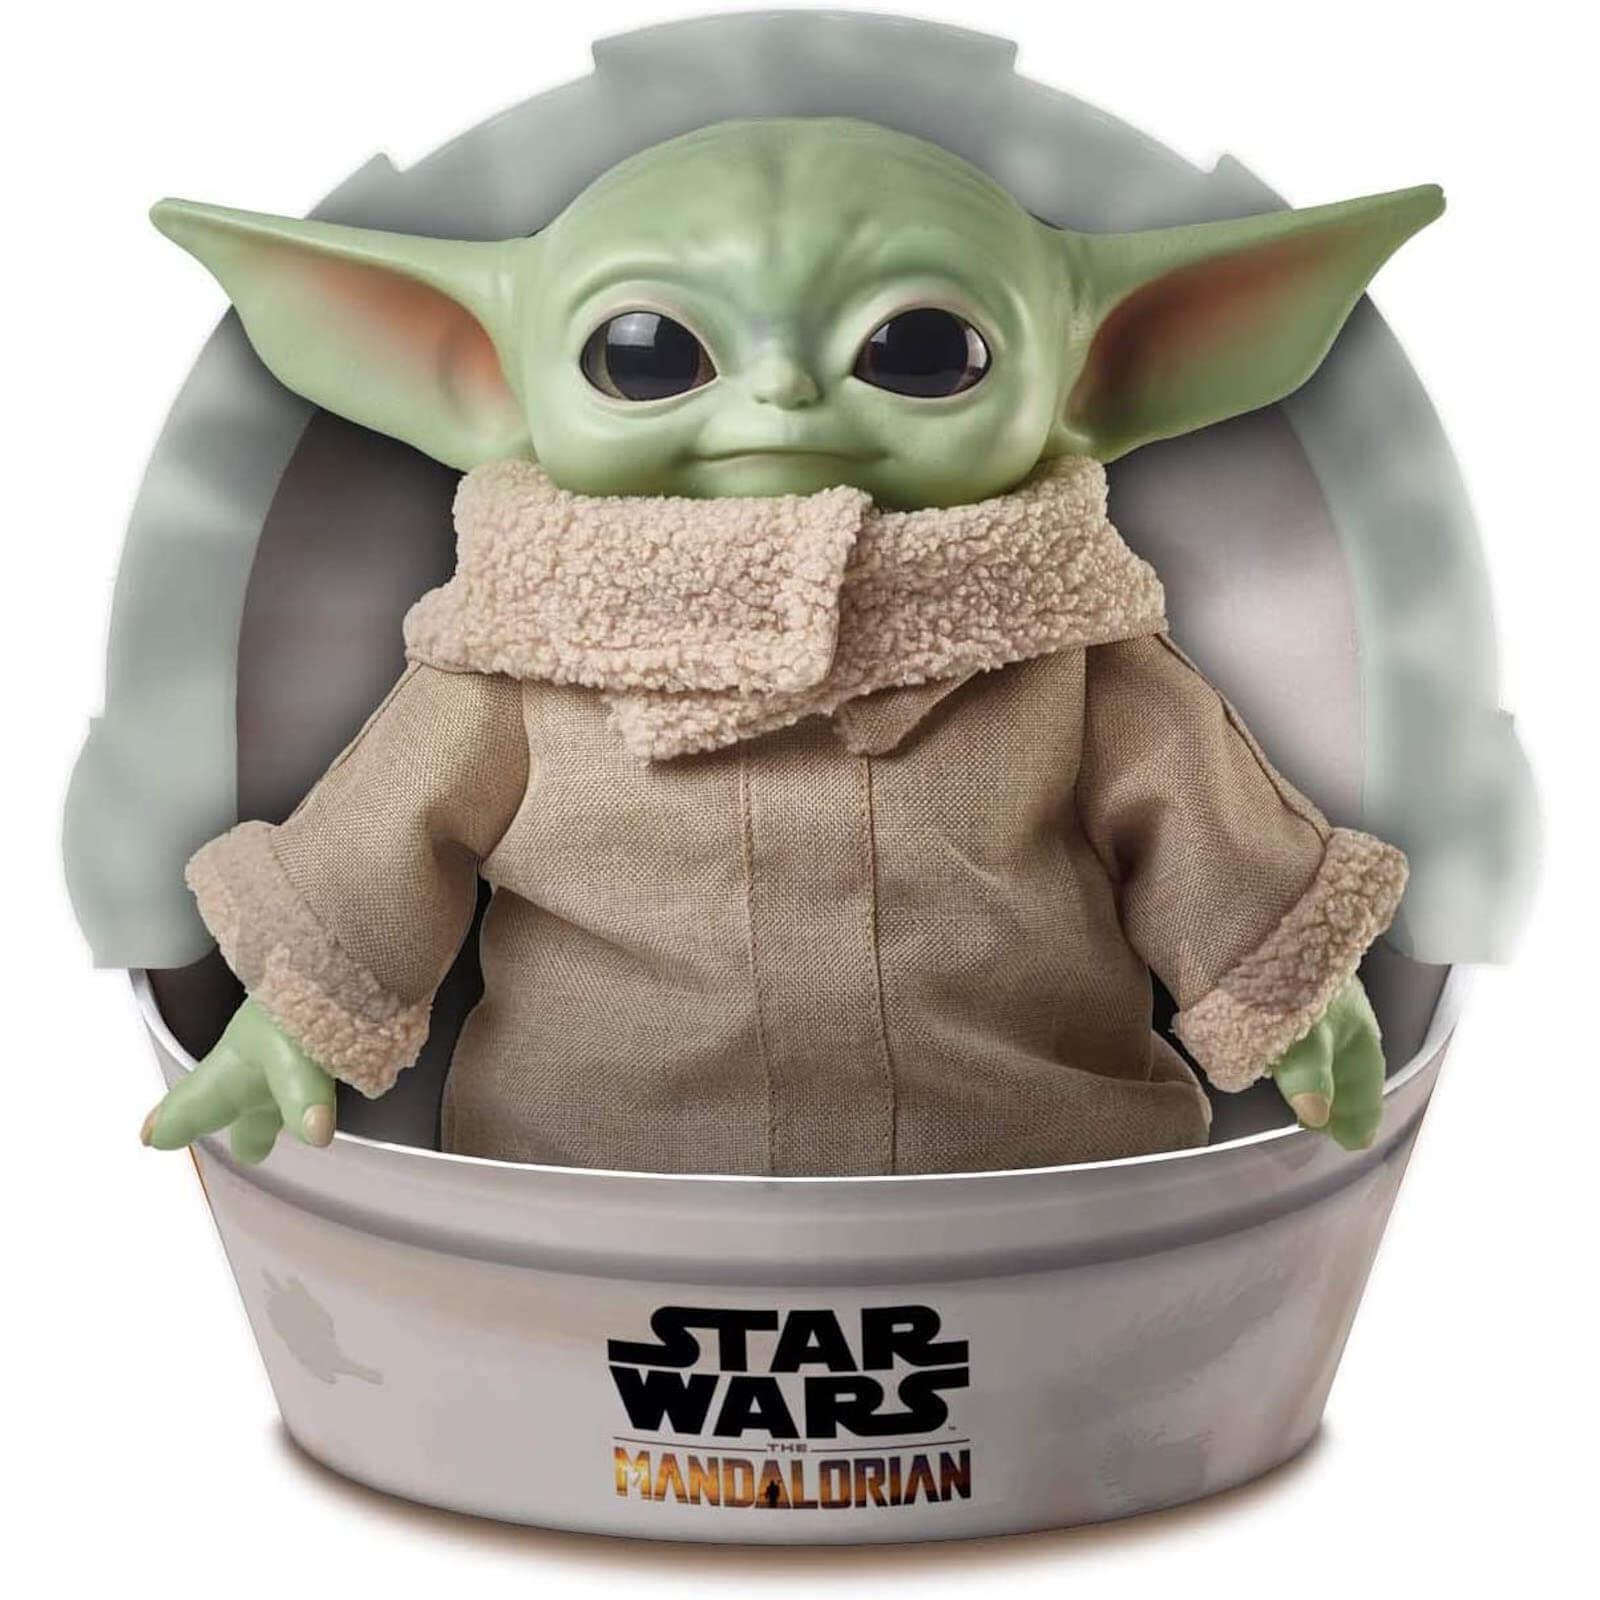 Image of Mattel Star Wars: The Mandalorian The Child (Baby Yoda) 11-Inch Plush